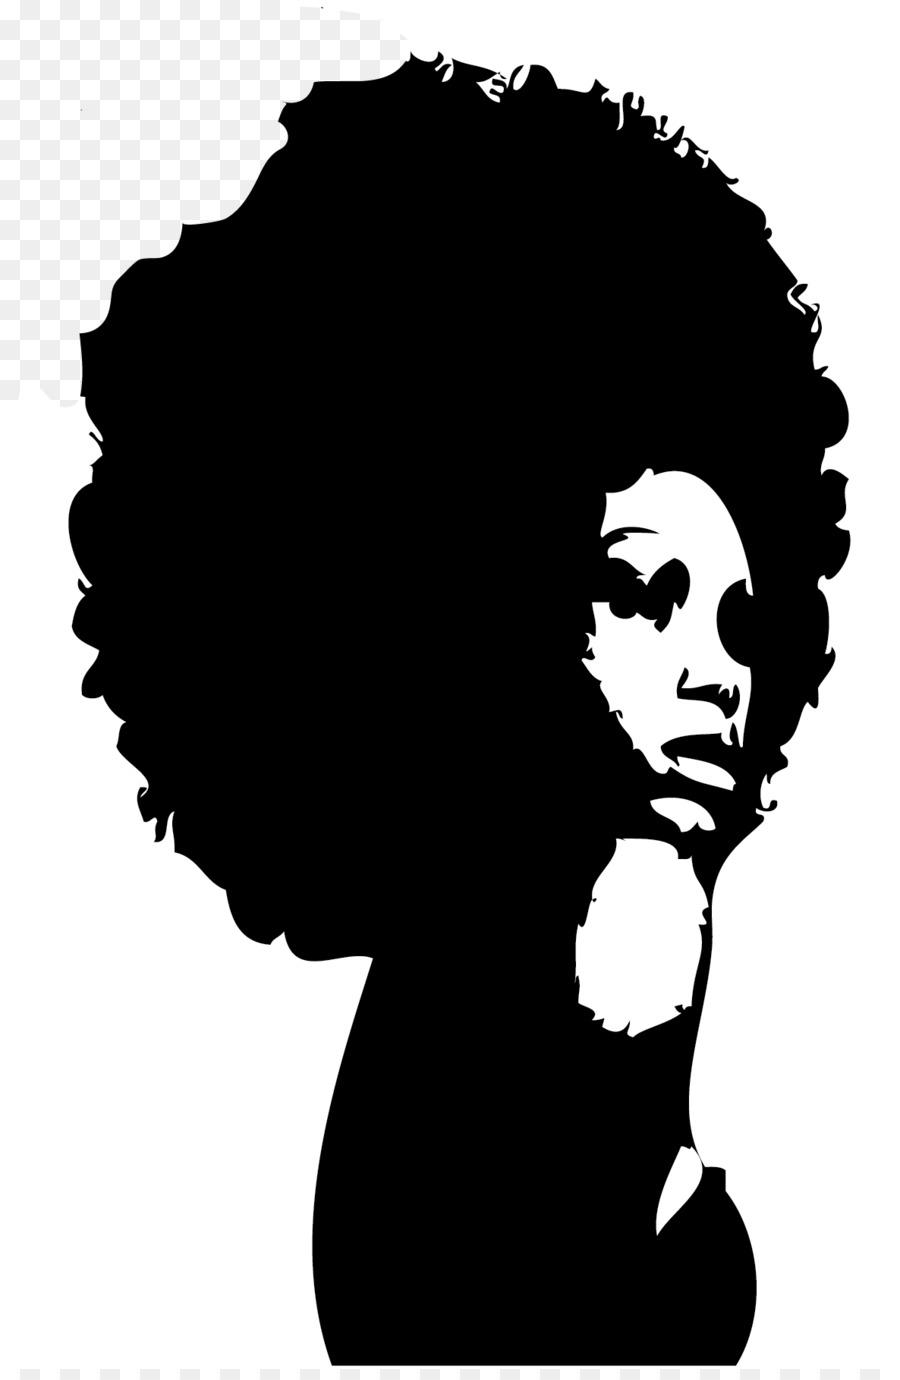 Black natural girl silhouette clipart image transparent download Natural Hair Png Black Woman Face Silhouette - Clip Art Library image transparent download